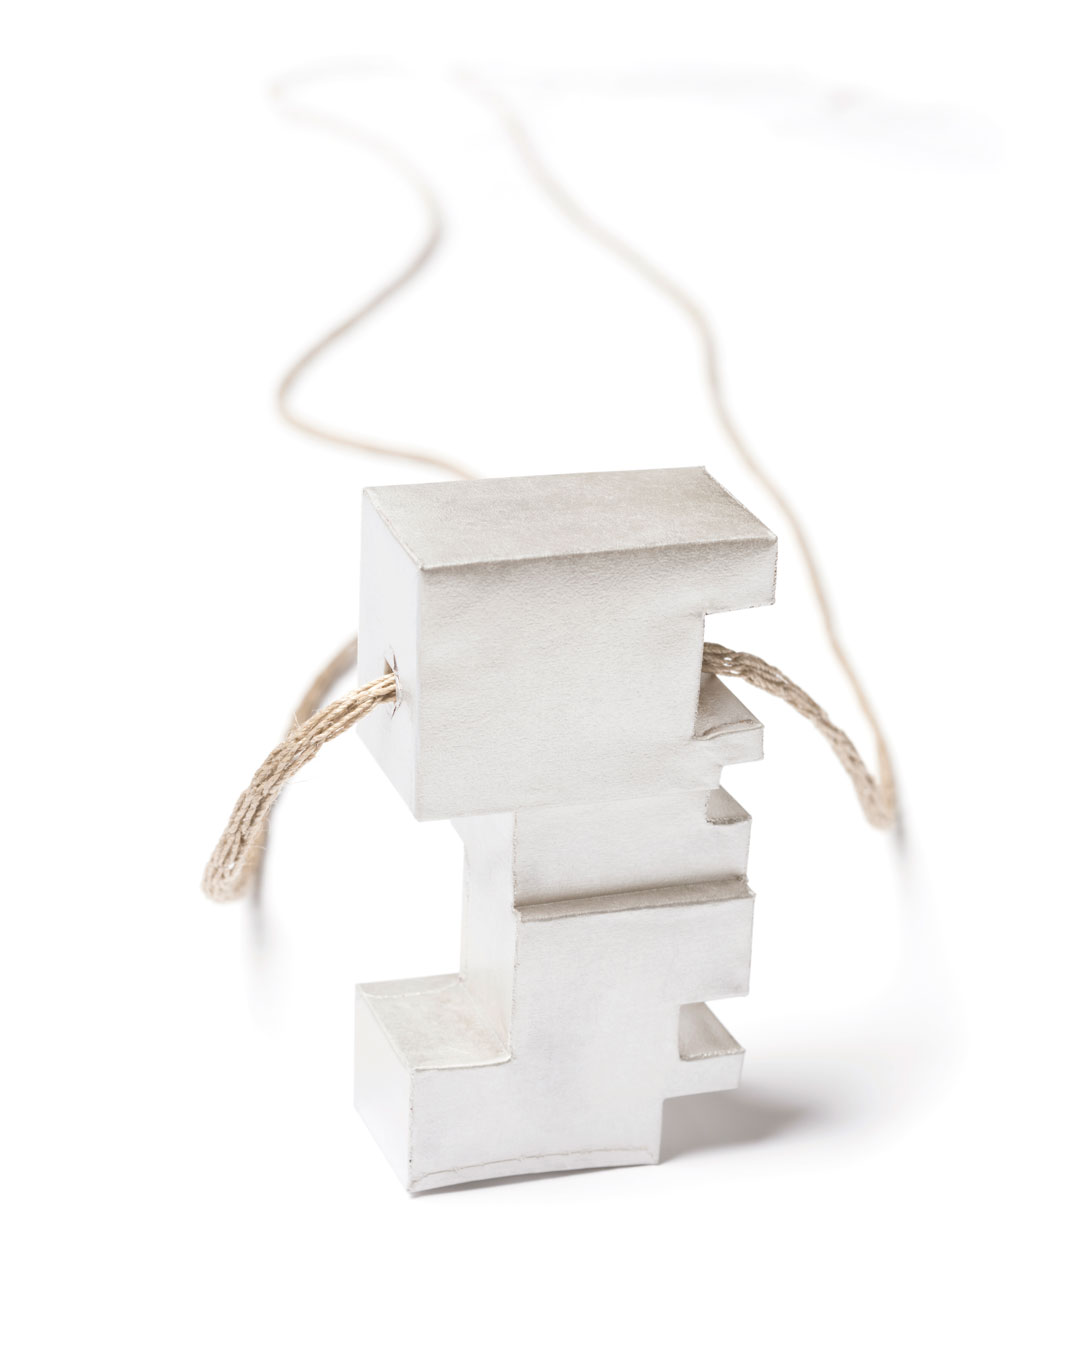 Carla Nuis, Unfurl 15, 2018, pendant; fine silver, linen, 57 x 30 x 17 mm, €710